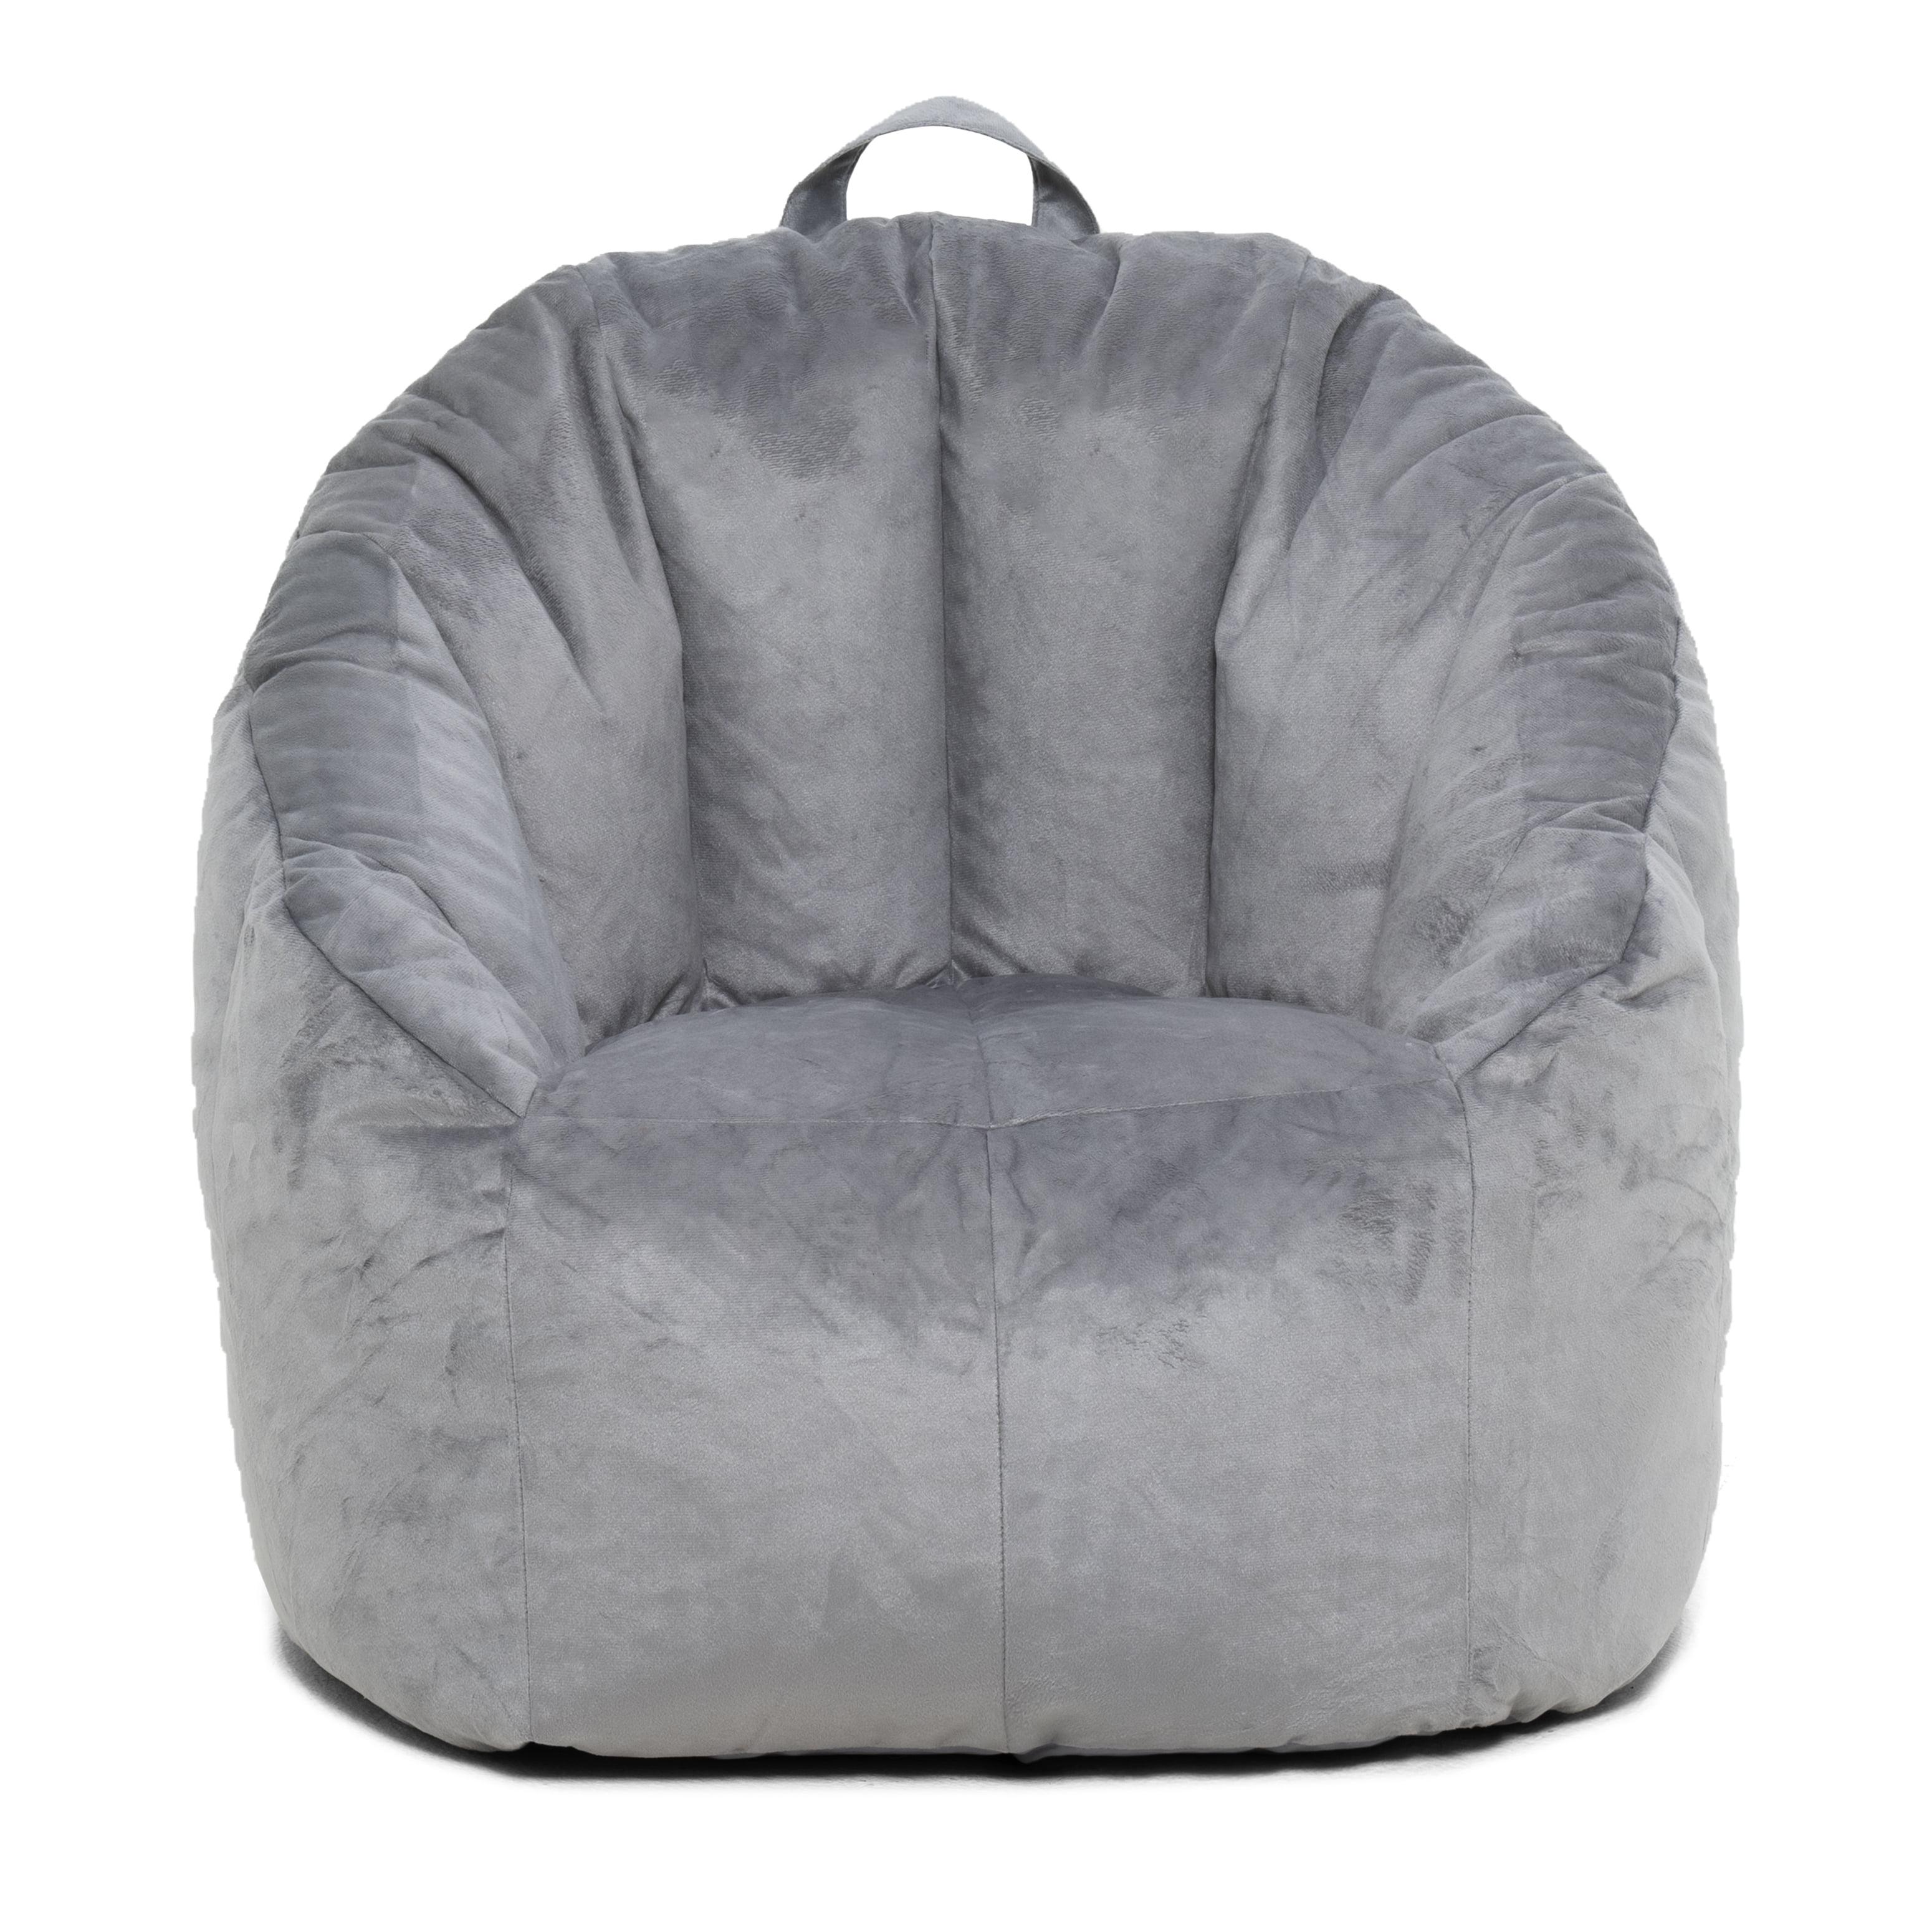 Super Big Joe Joey Bean Bag Chair Gray 28 5 X 24 5 X 26 5 Pabps2019 Chair Design Images Pabps2019Com